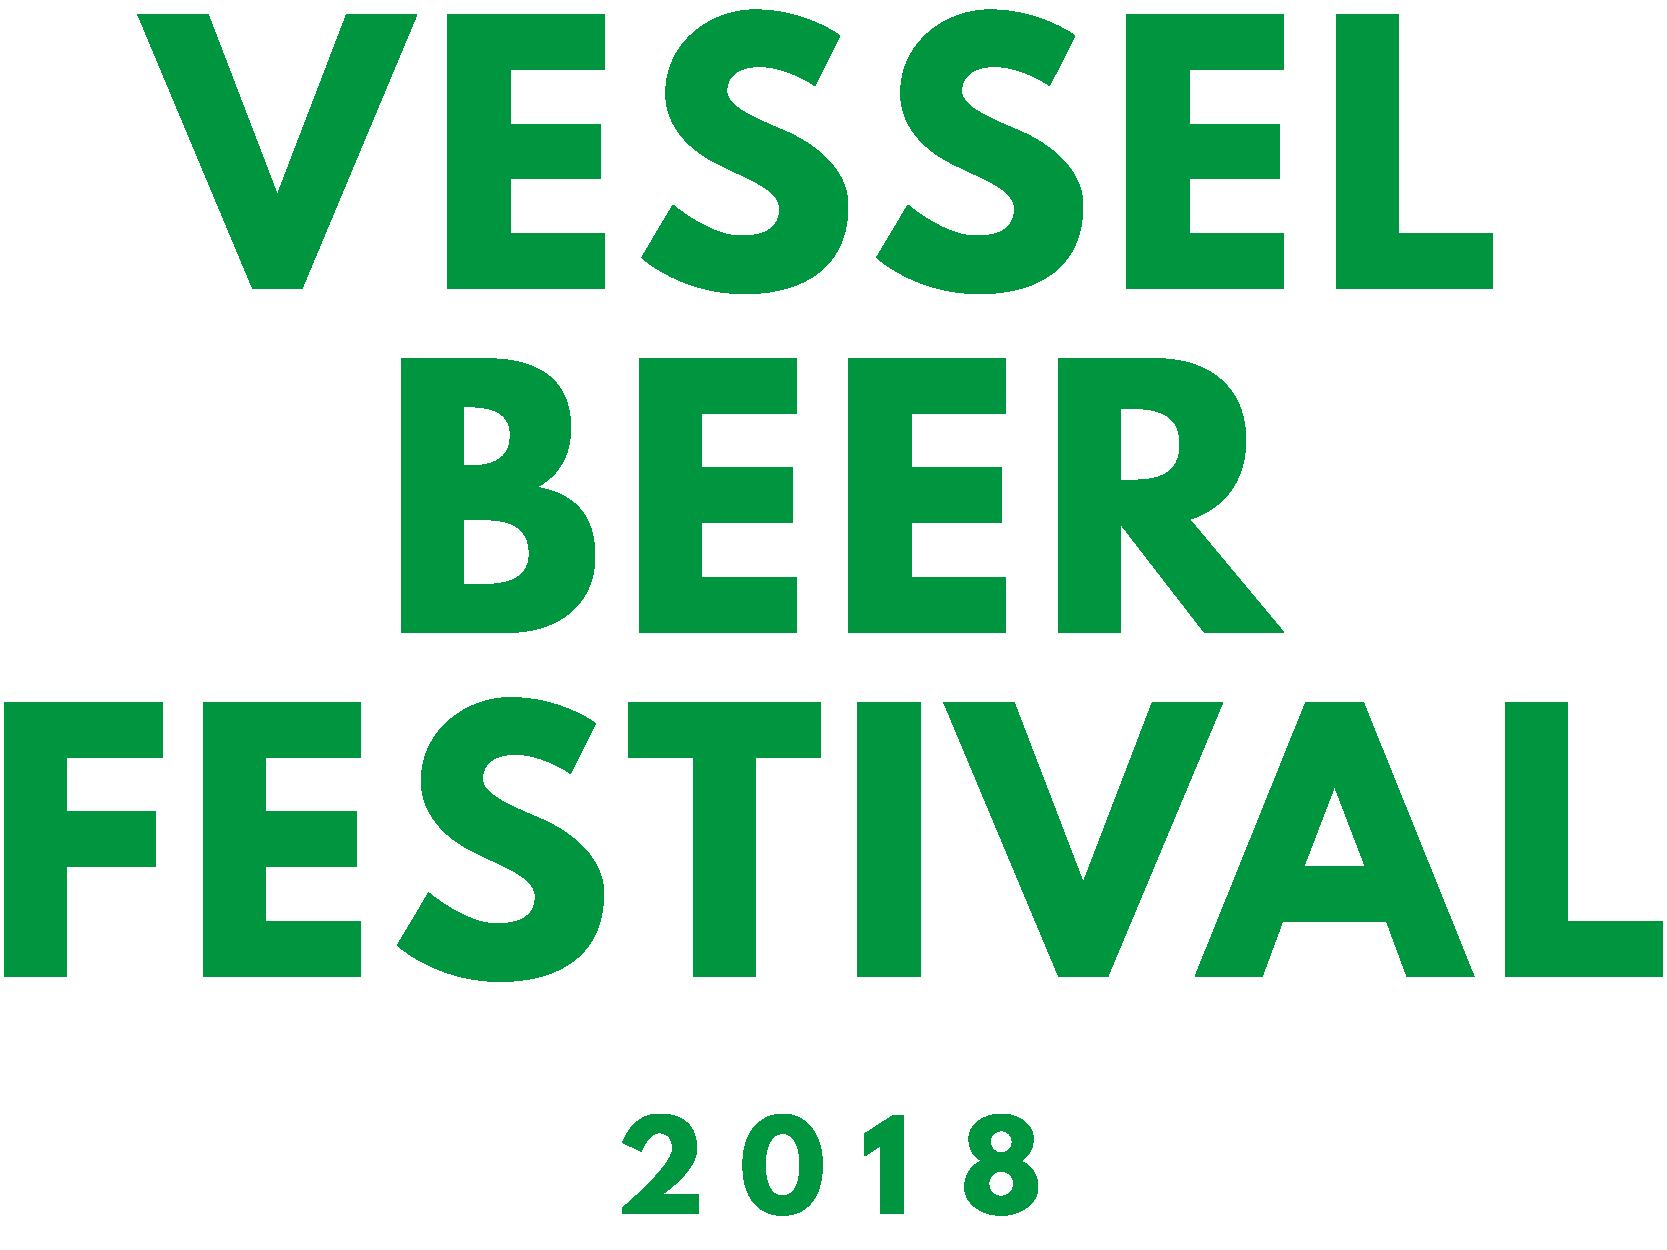 Vessel Beer Festival 2018